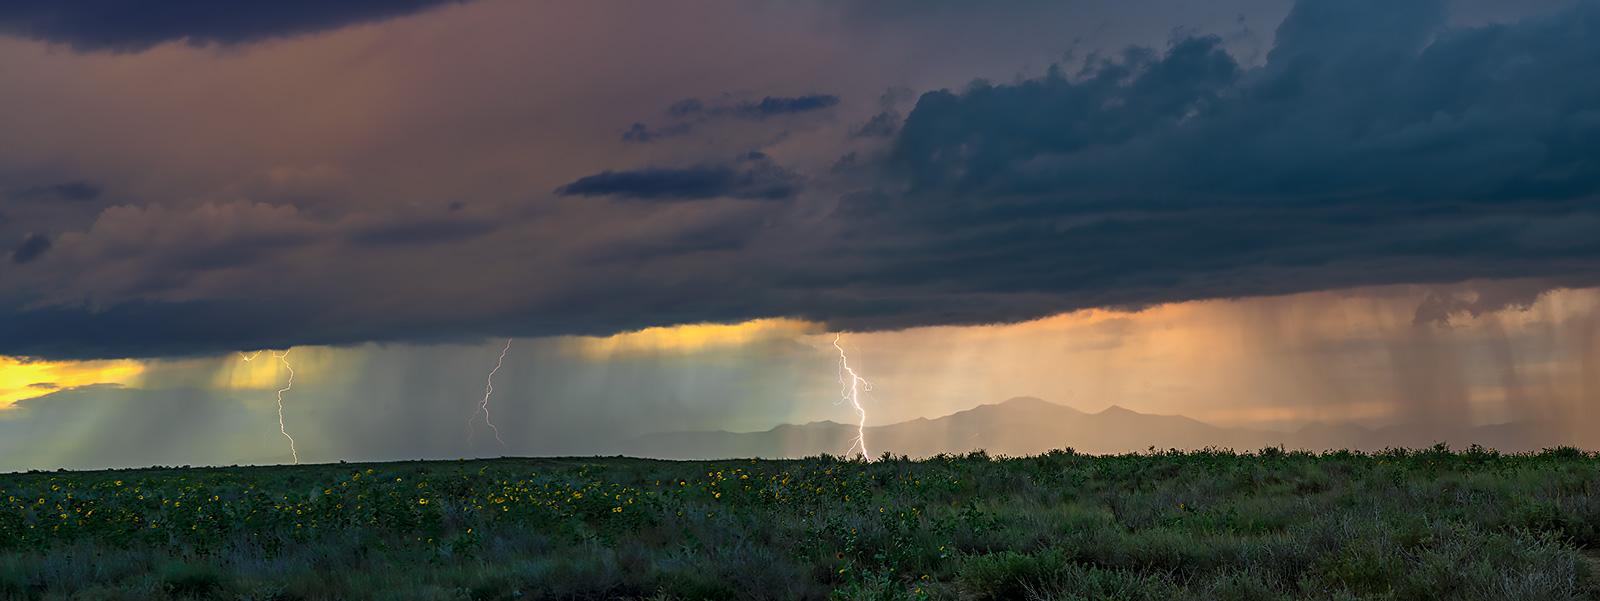 Pikes Peak, panorama,lightning,storm,sunset, photo